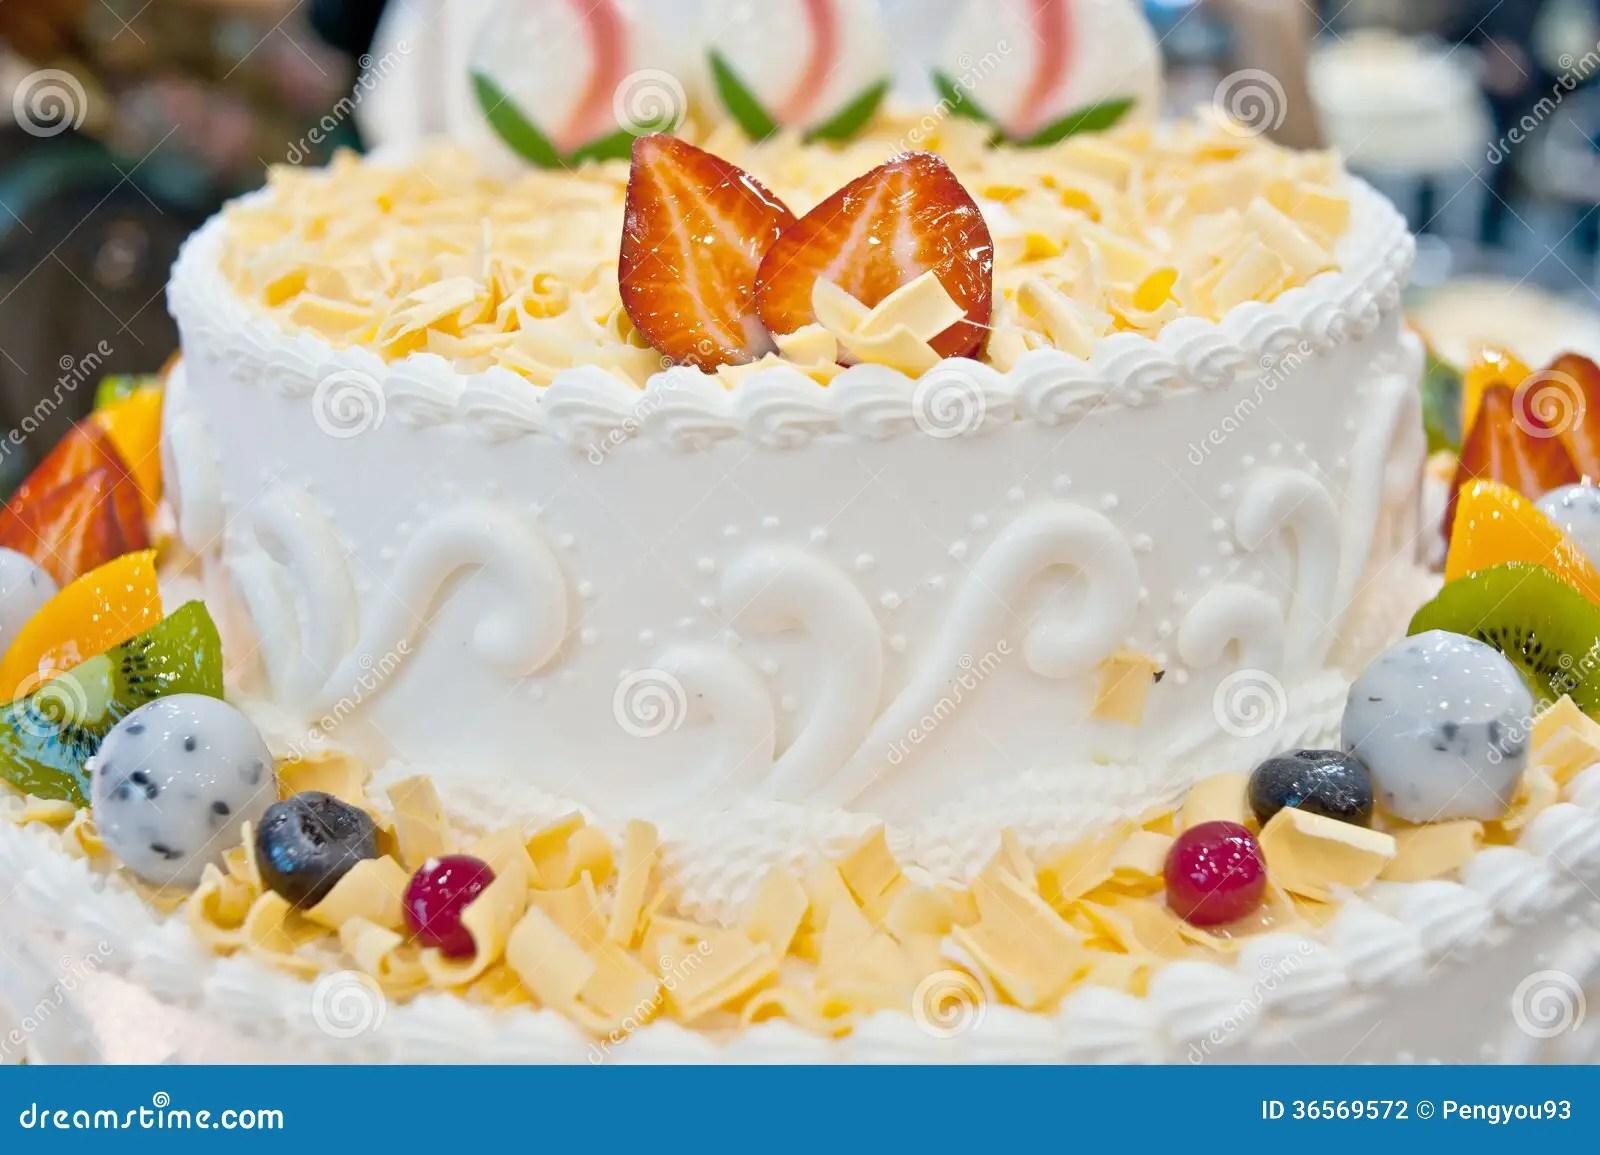 Birthday Cakes Pastries Design Stock Photo Image 36569572